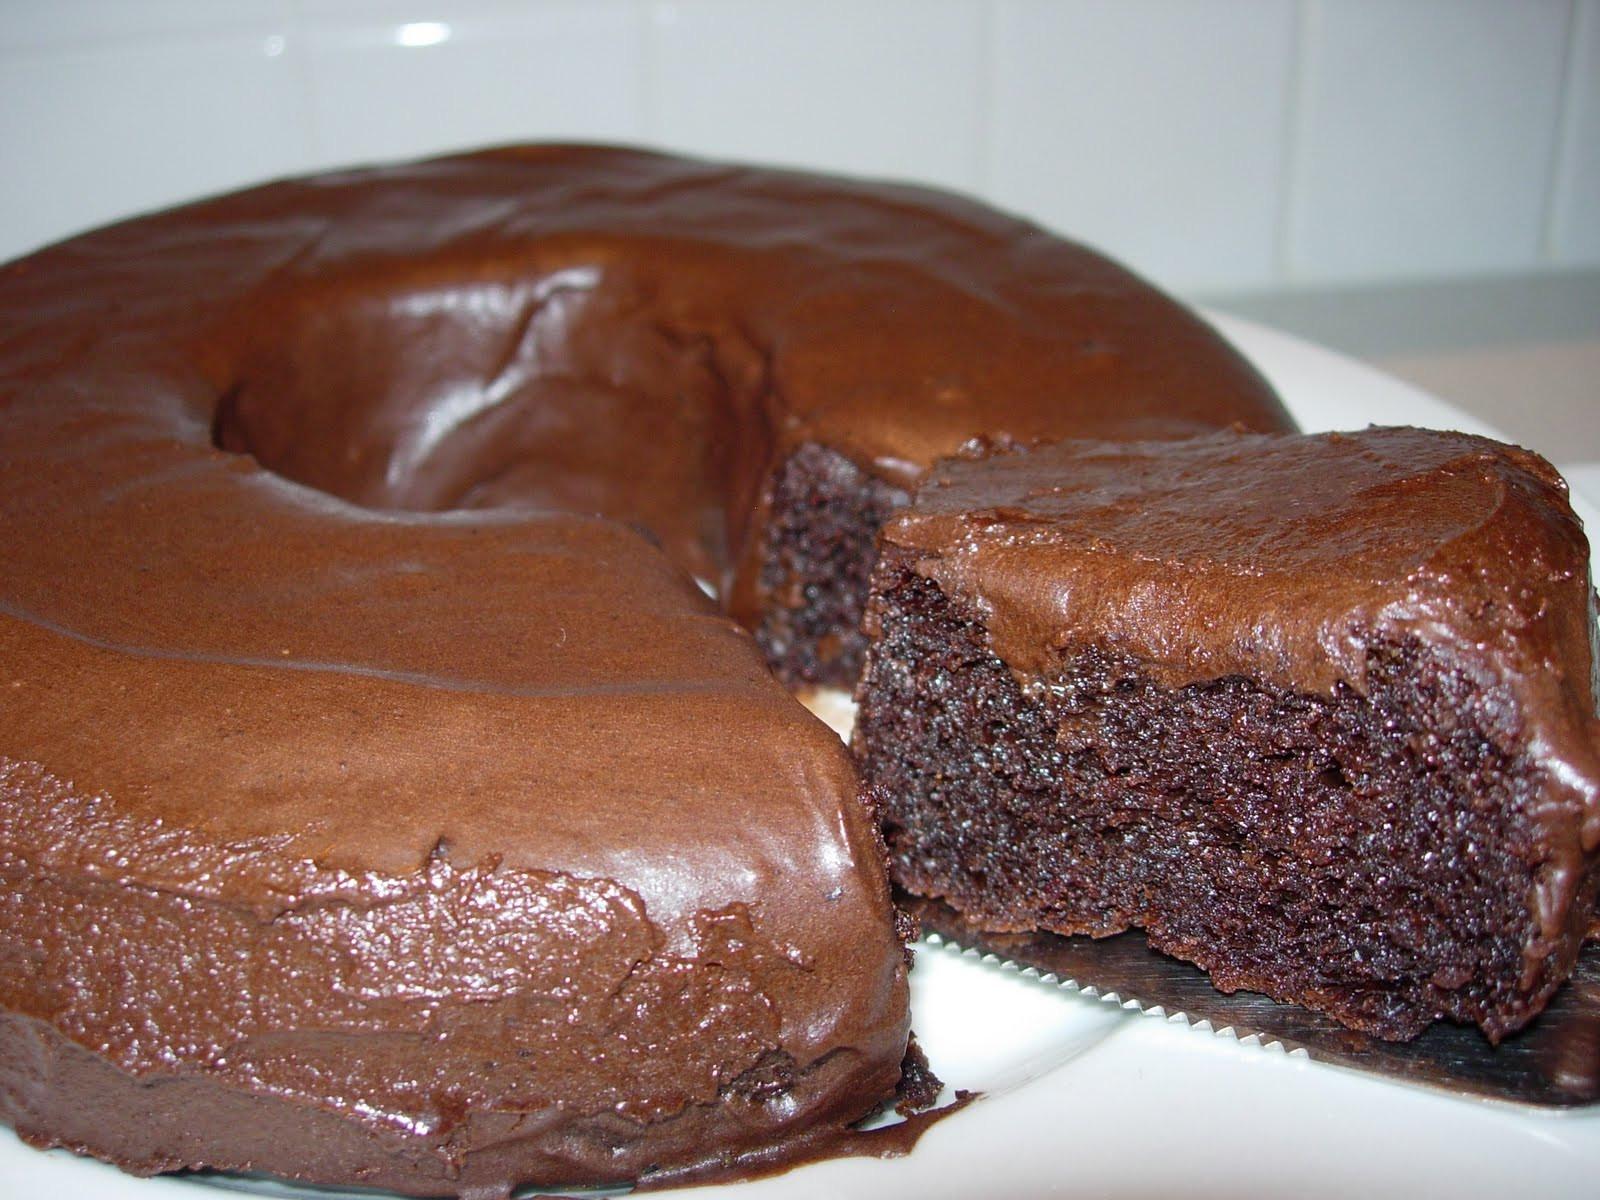 Easy Chocolate Cake Recipes  Allergy Friendly Recipes Super Easy Yummy Chocolate Cake